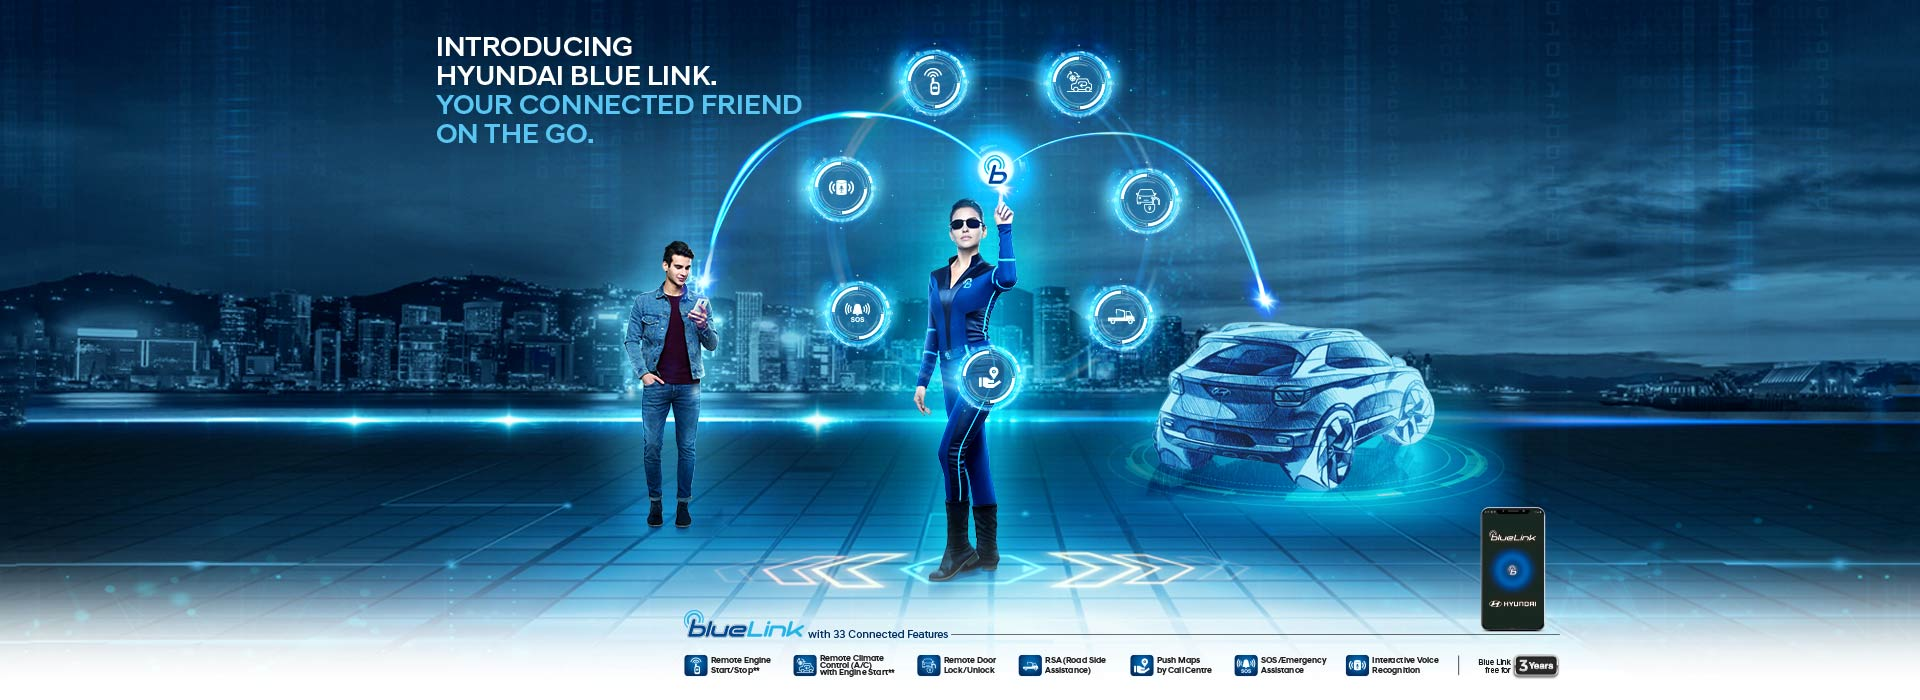 Sanjay Hyundai: Authorized new car dealership serving and servicing